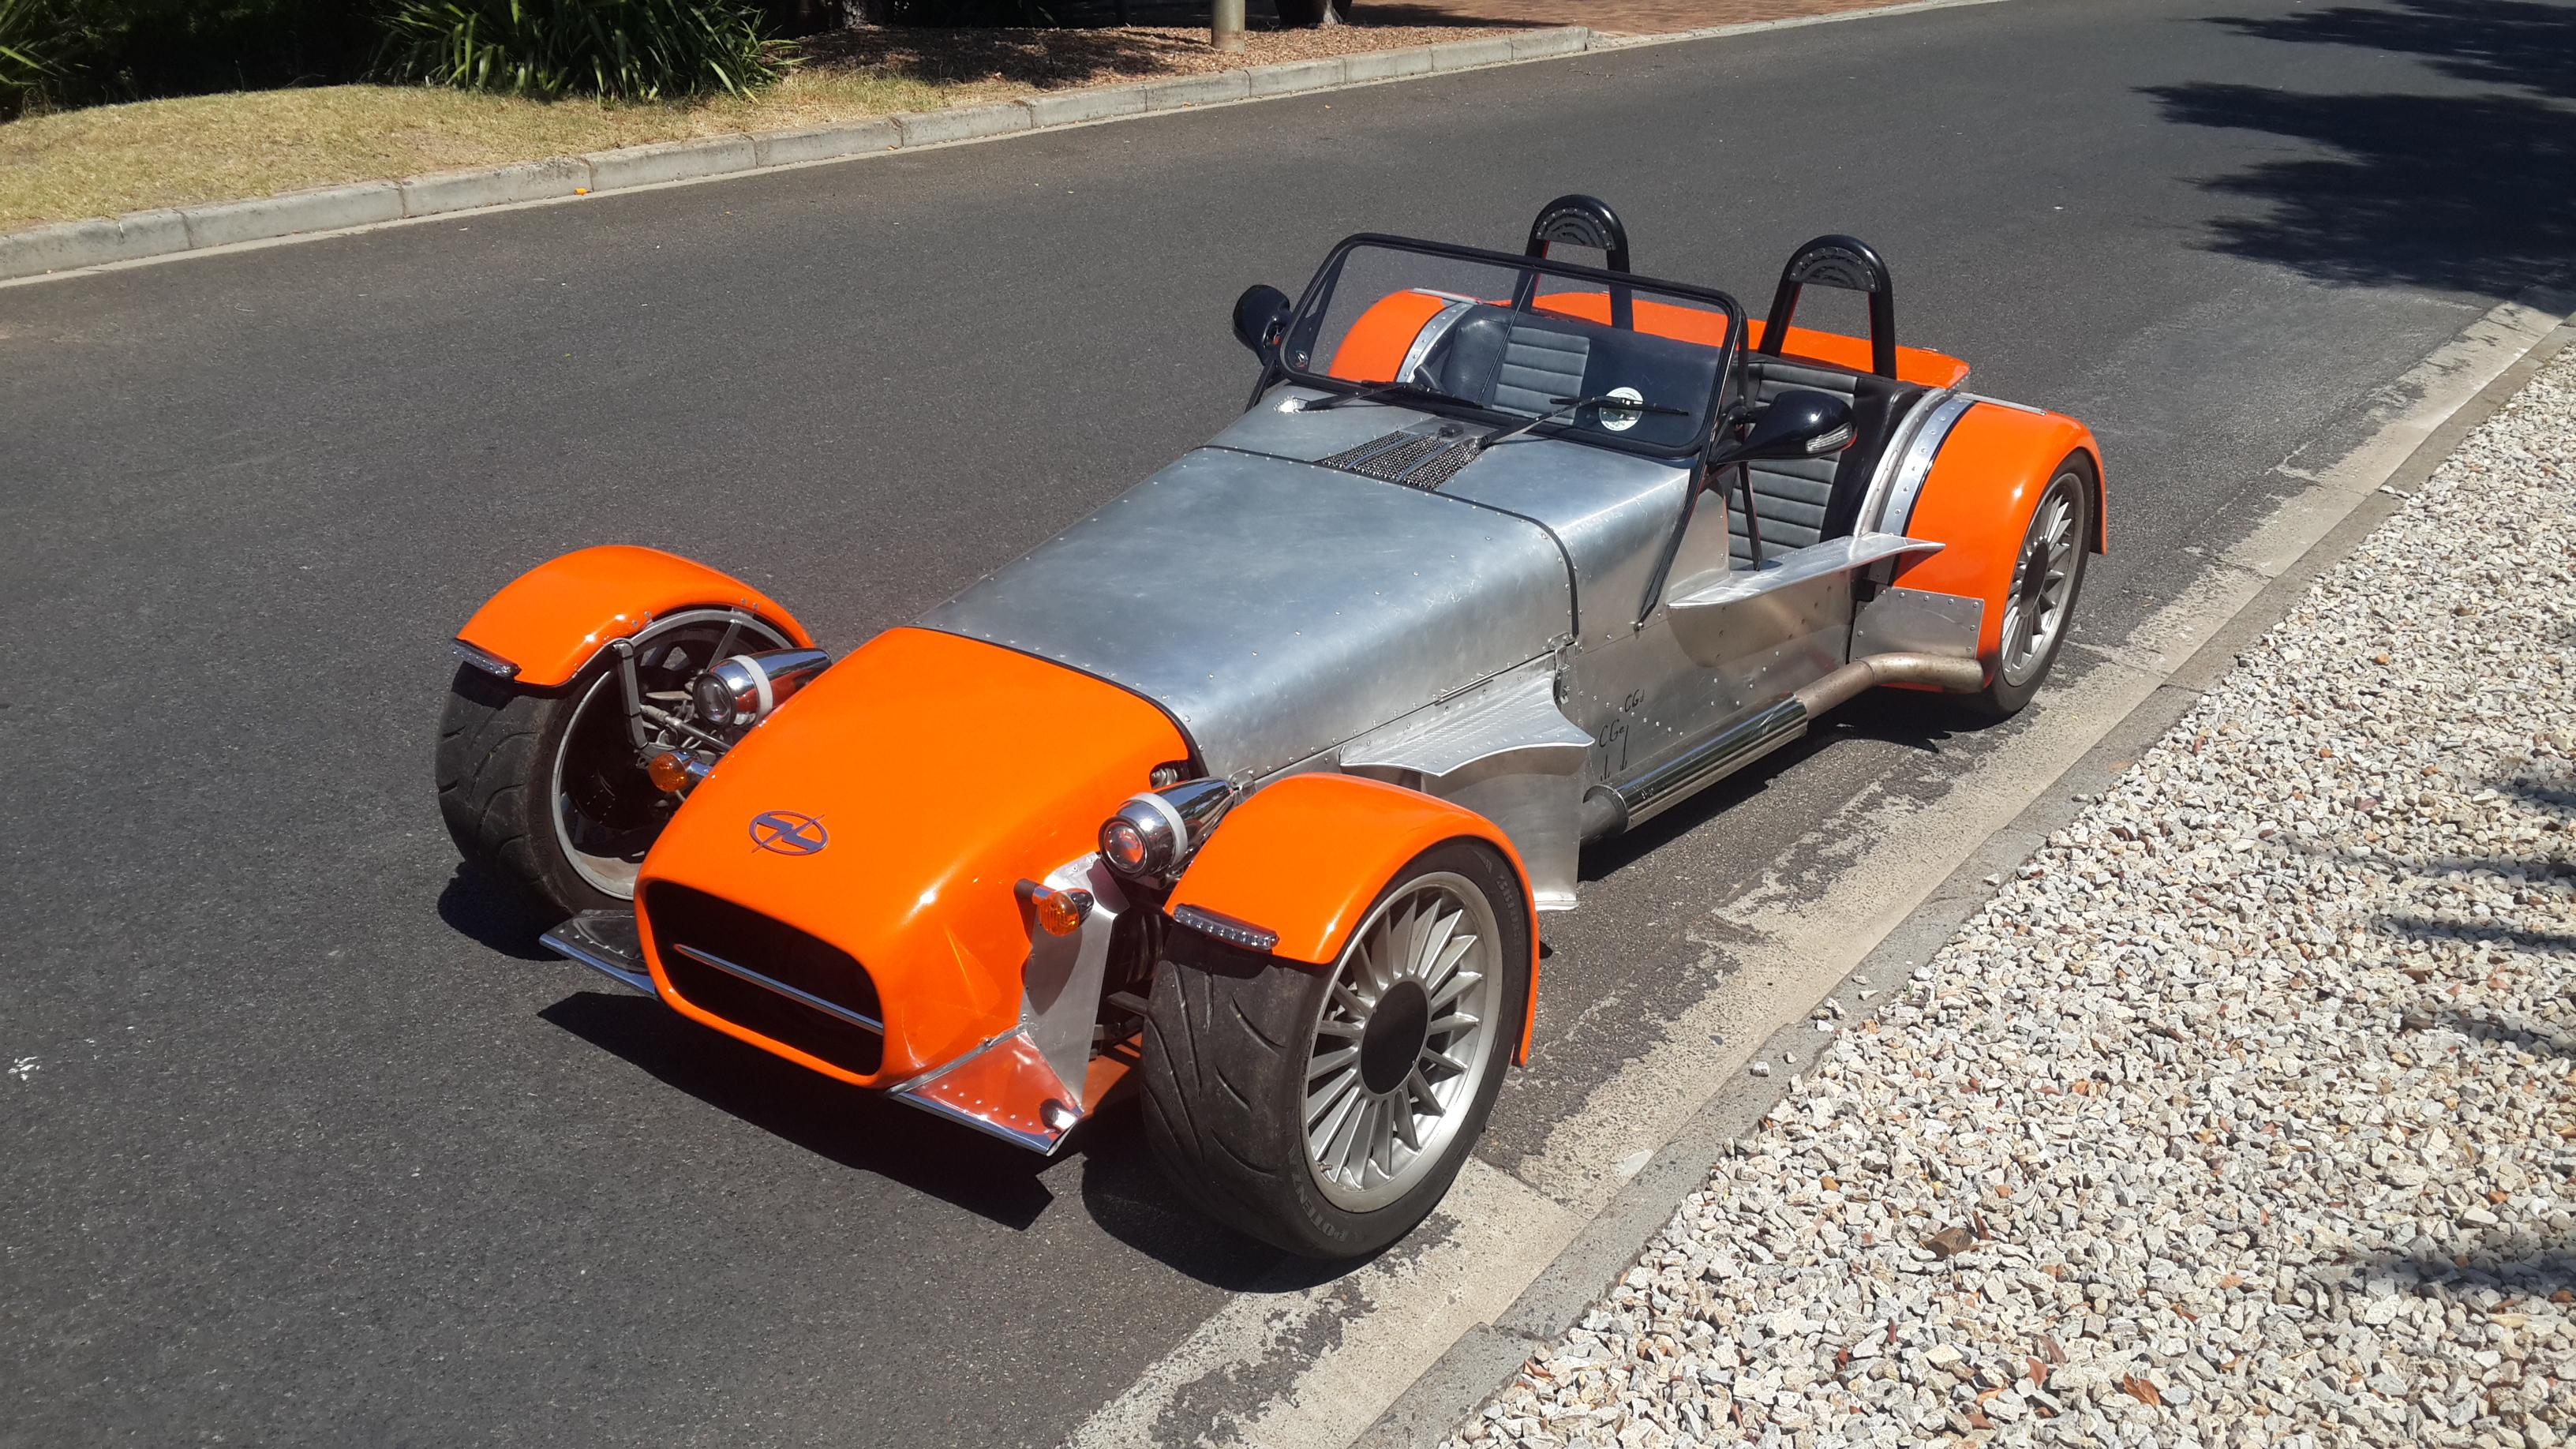 Lotus 7 Replica, Professionally Built